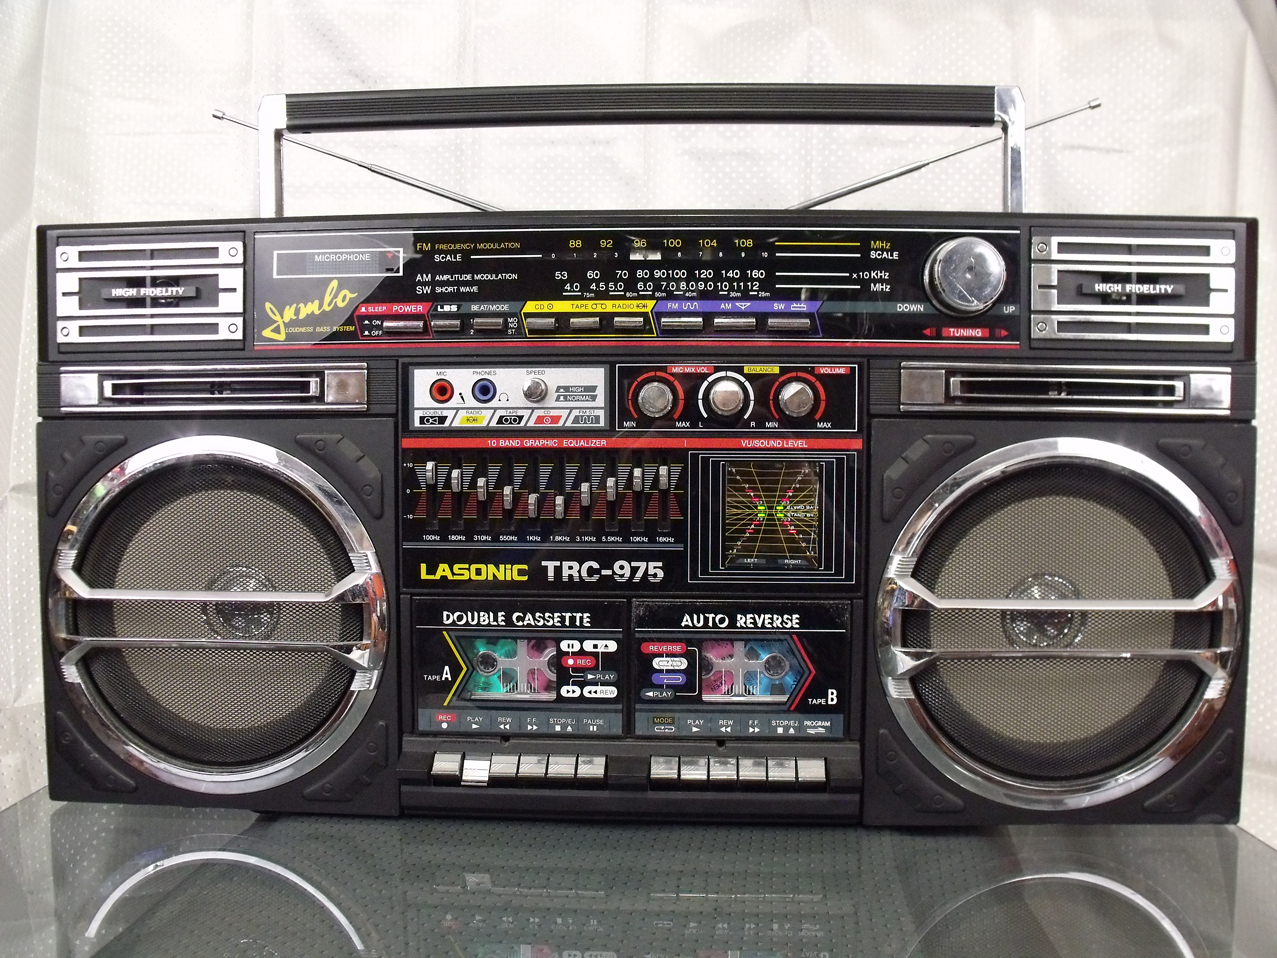 throwback hip hop station 105 1 fm is the new king of detroit radio. Black Bedroom Furniture Sets. Home Design Ideas